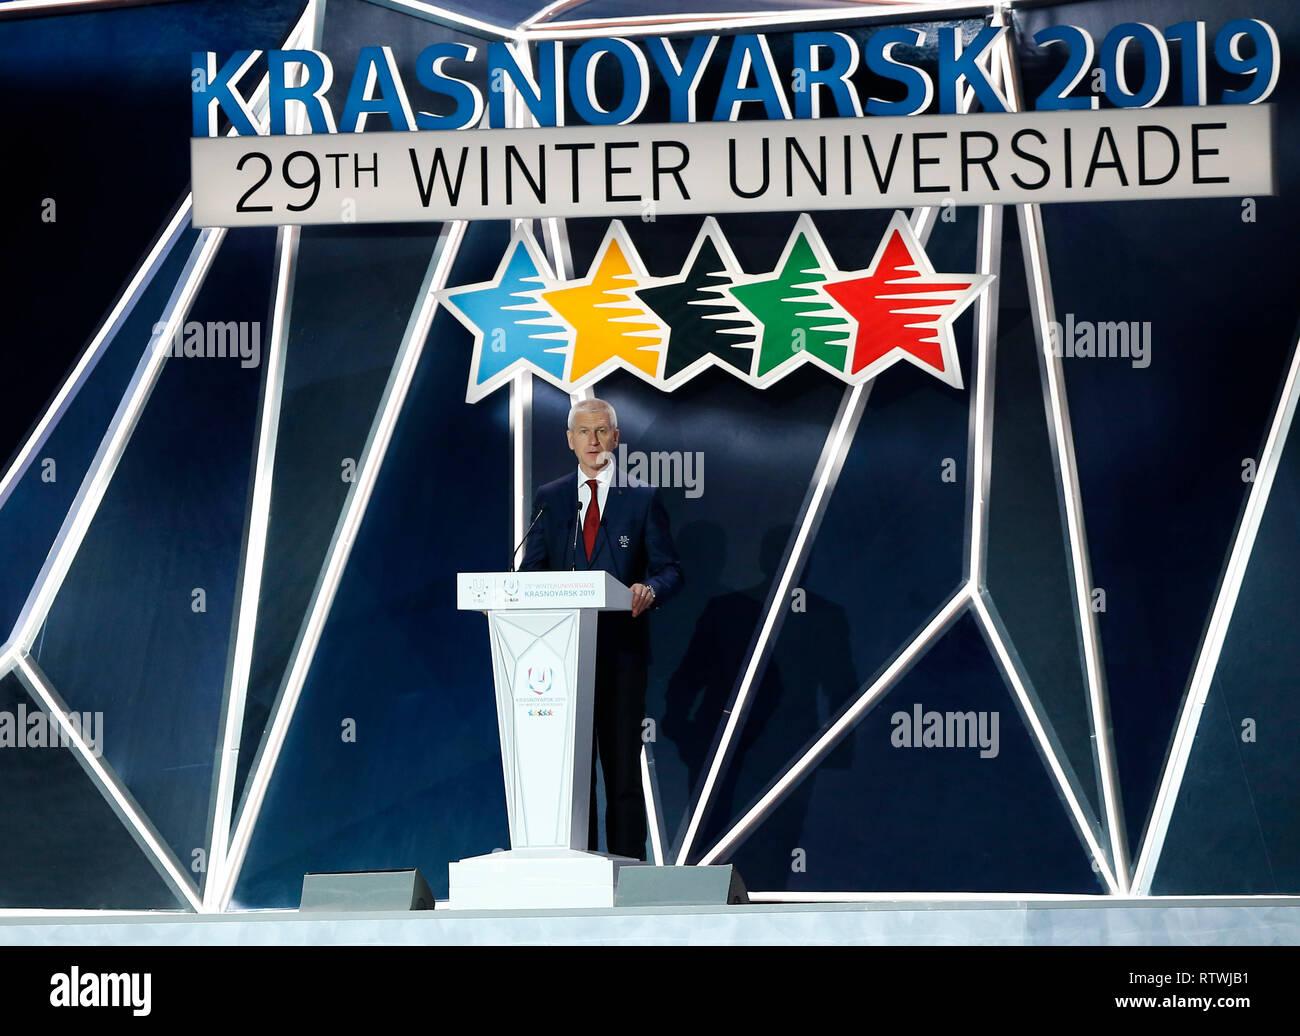 Krasnoyarsk, Russia. 2nd Mar, 2019. International University Sports Federation (FISU) President Oleg Matytsin addresses the opening ceremony of 29th Winter Universiade in Krasnoyarsk, Russia, March 2, 2019. Credit: Wang Dongzhen/Xinhua/Alamy Live News - Stock Image